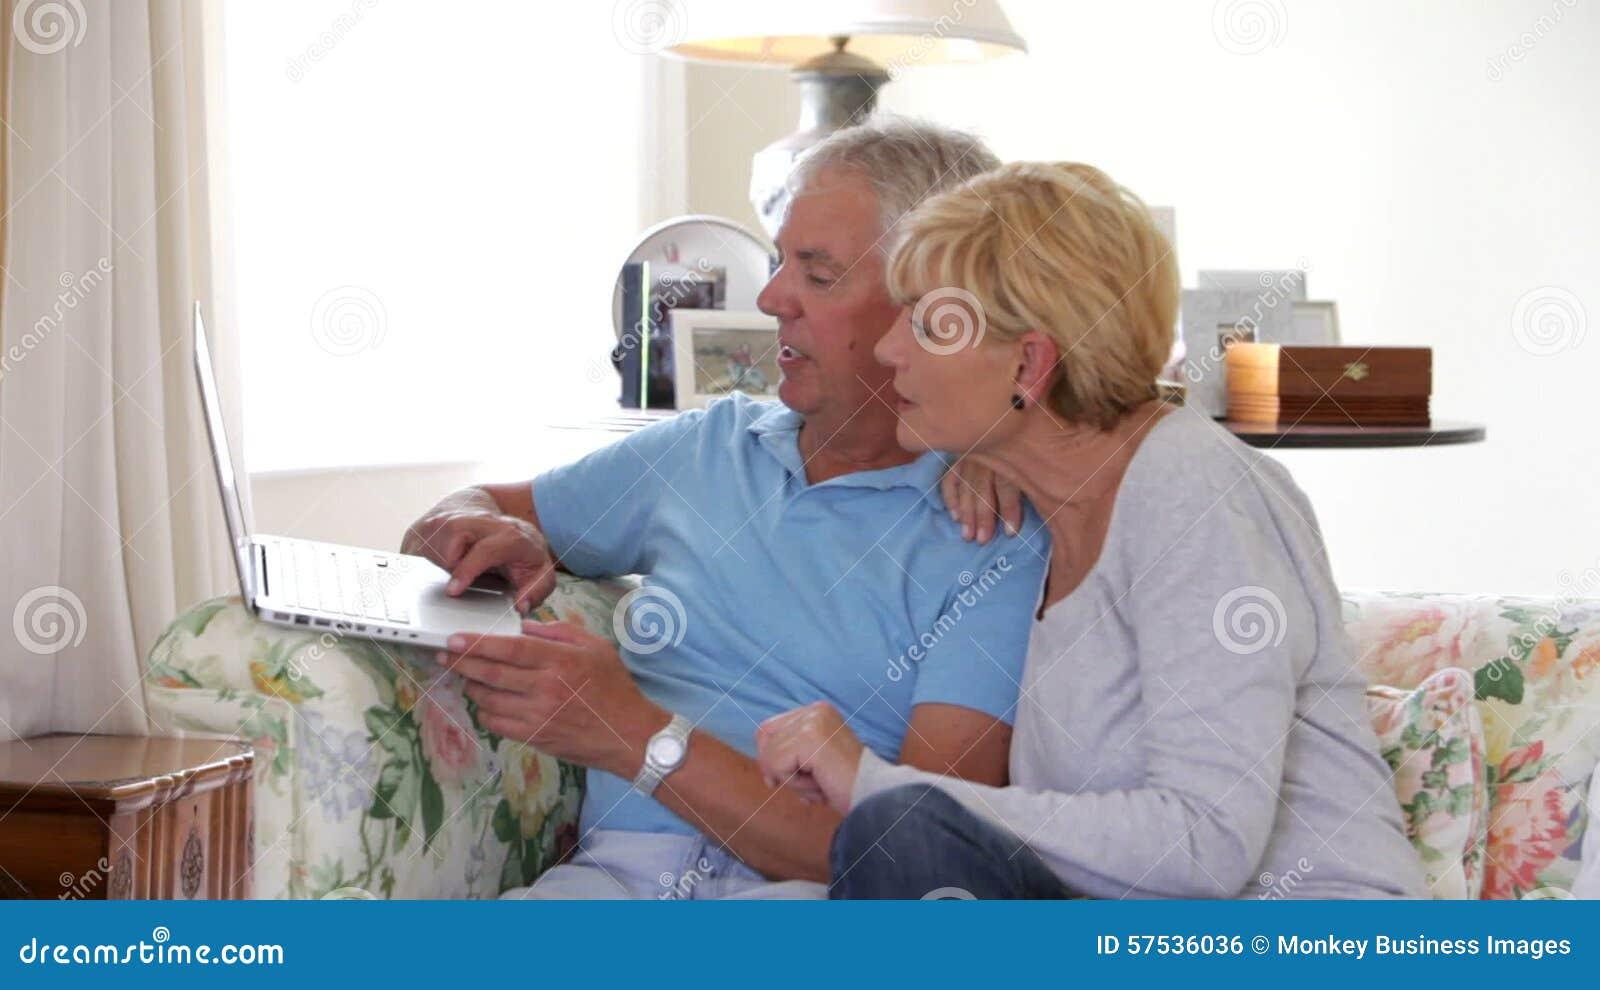 Mature Couple Sitting On Sofa Using Laptop Stock Footage - Video of  lockdown, laptop: 57536036